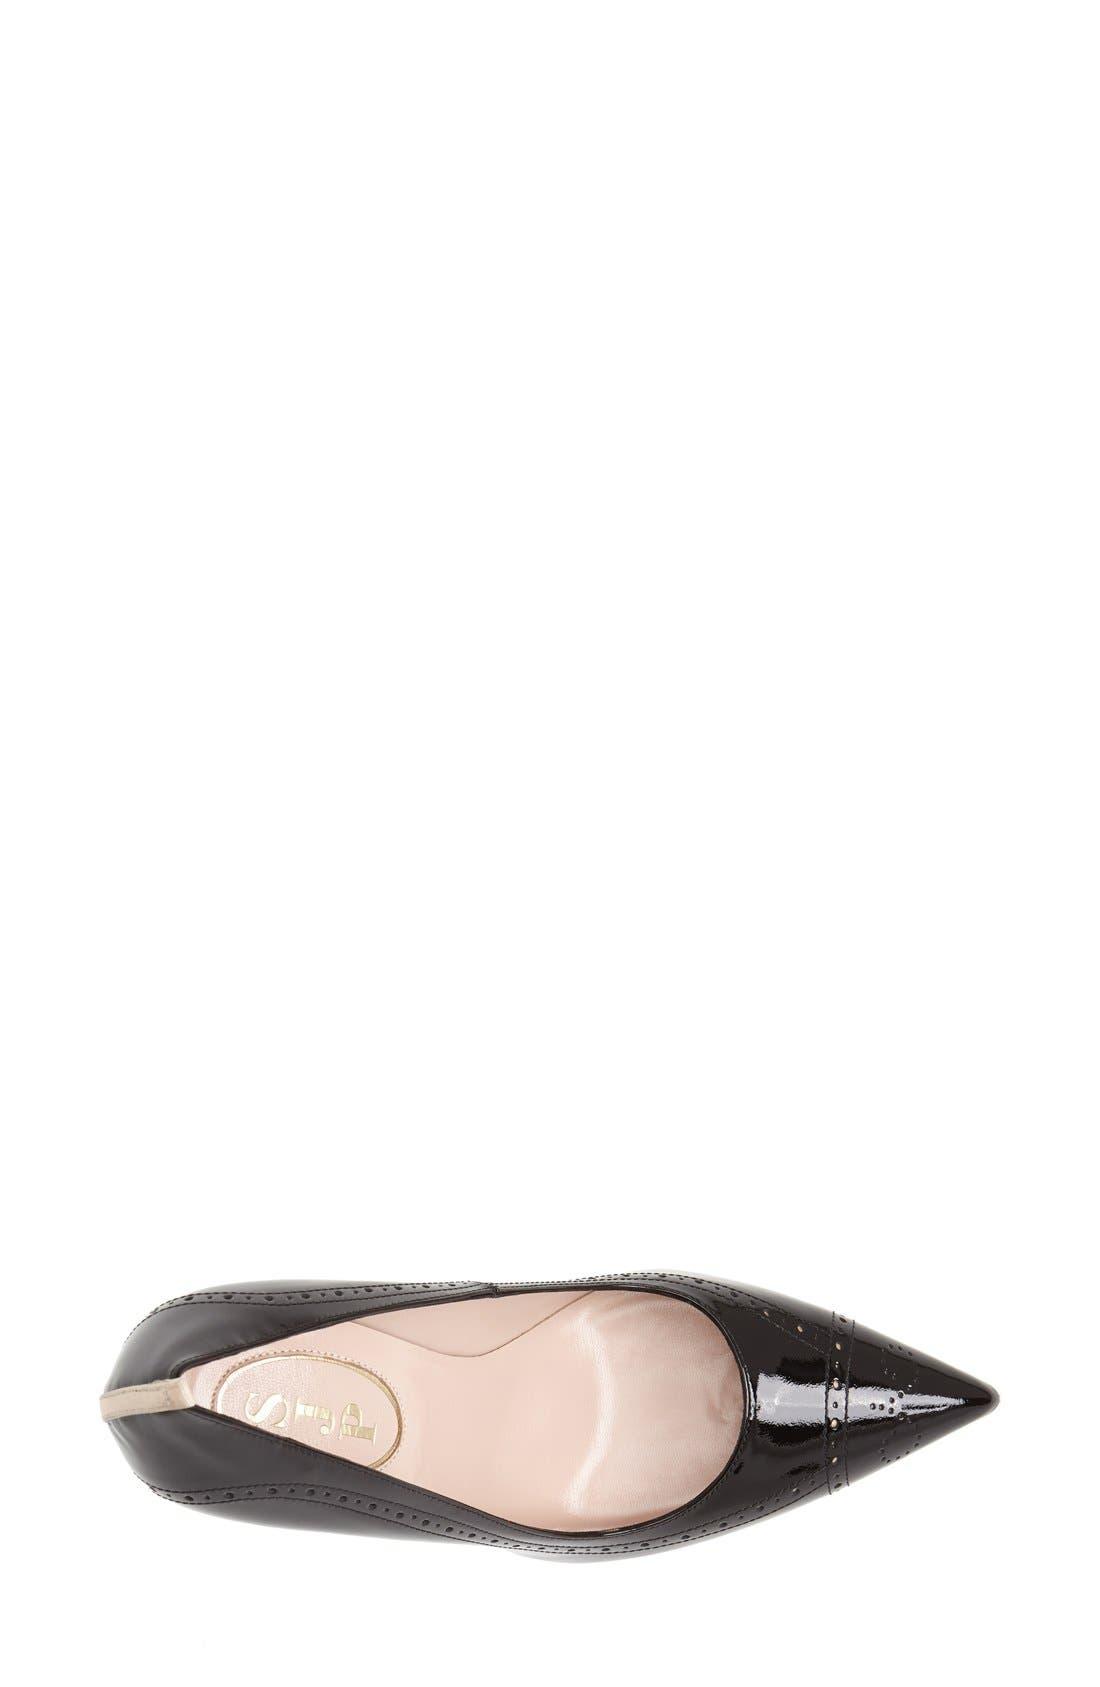 Alternate Image 3  - SJP by Sarah Jessica Parker 'Marlene' Brogue Detail Pointy Toe Pump